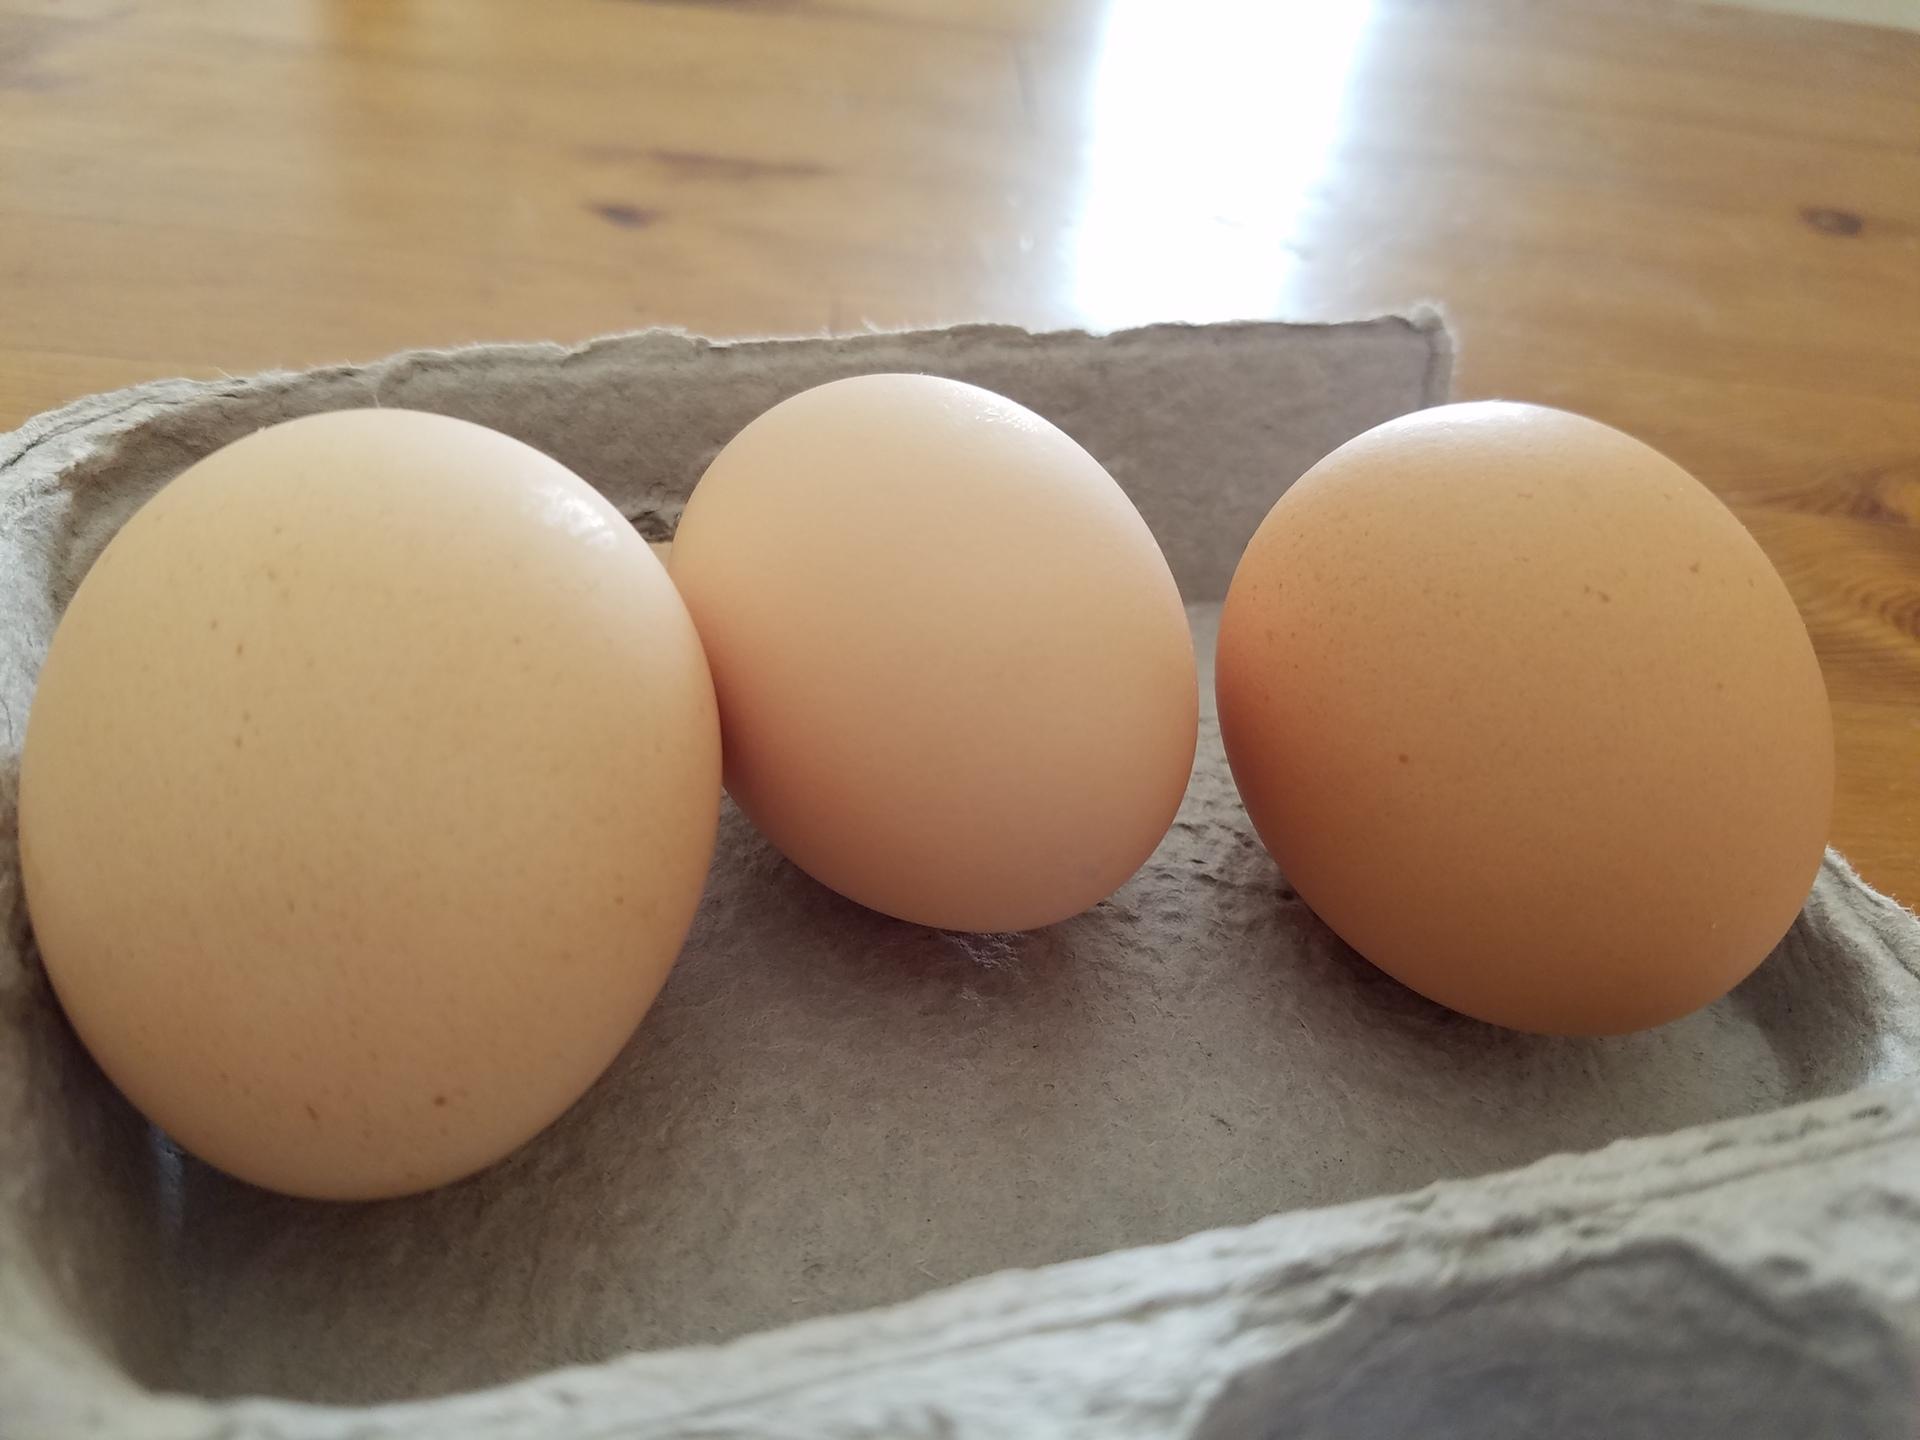 Eatwell eggs